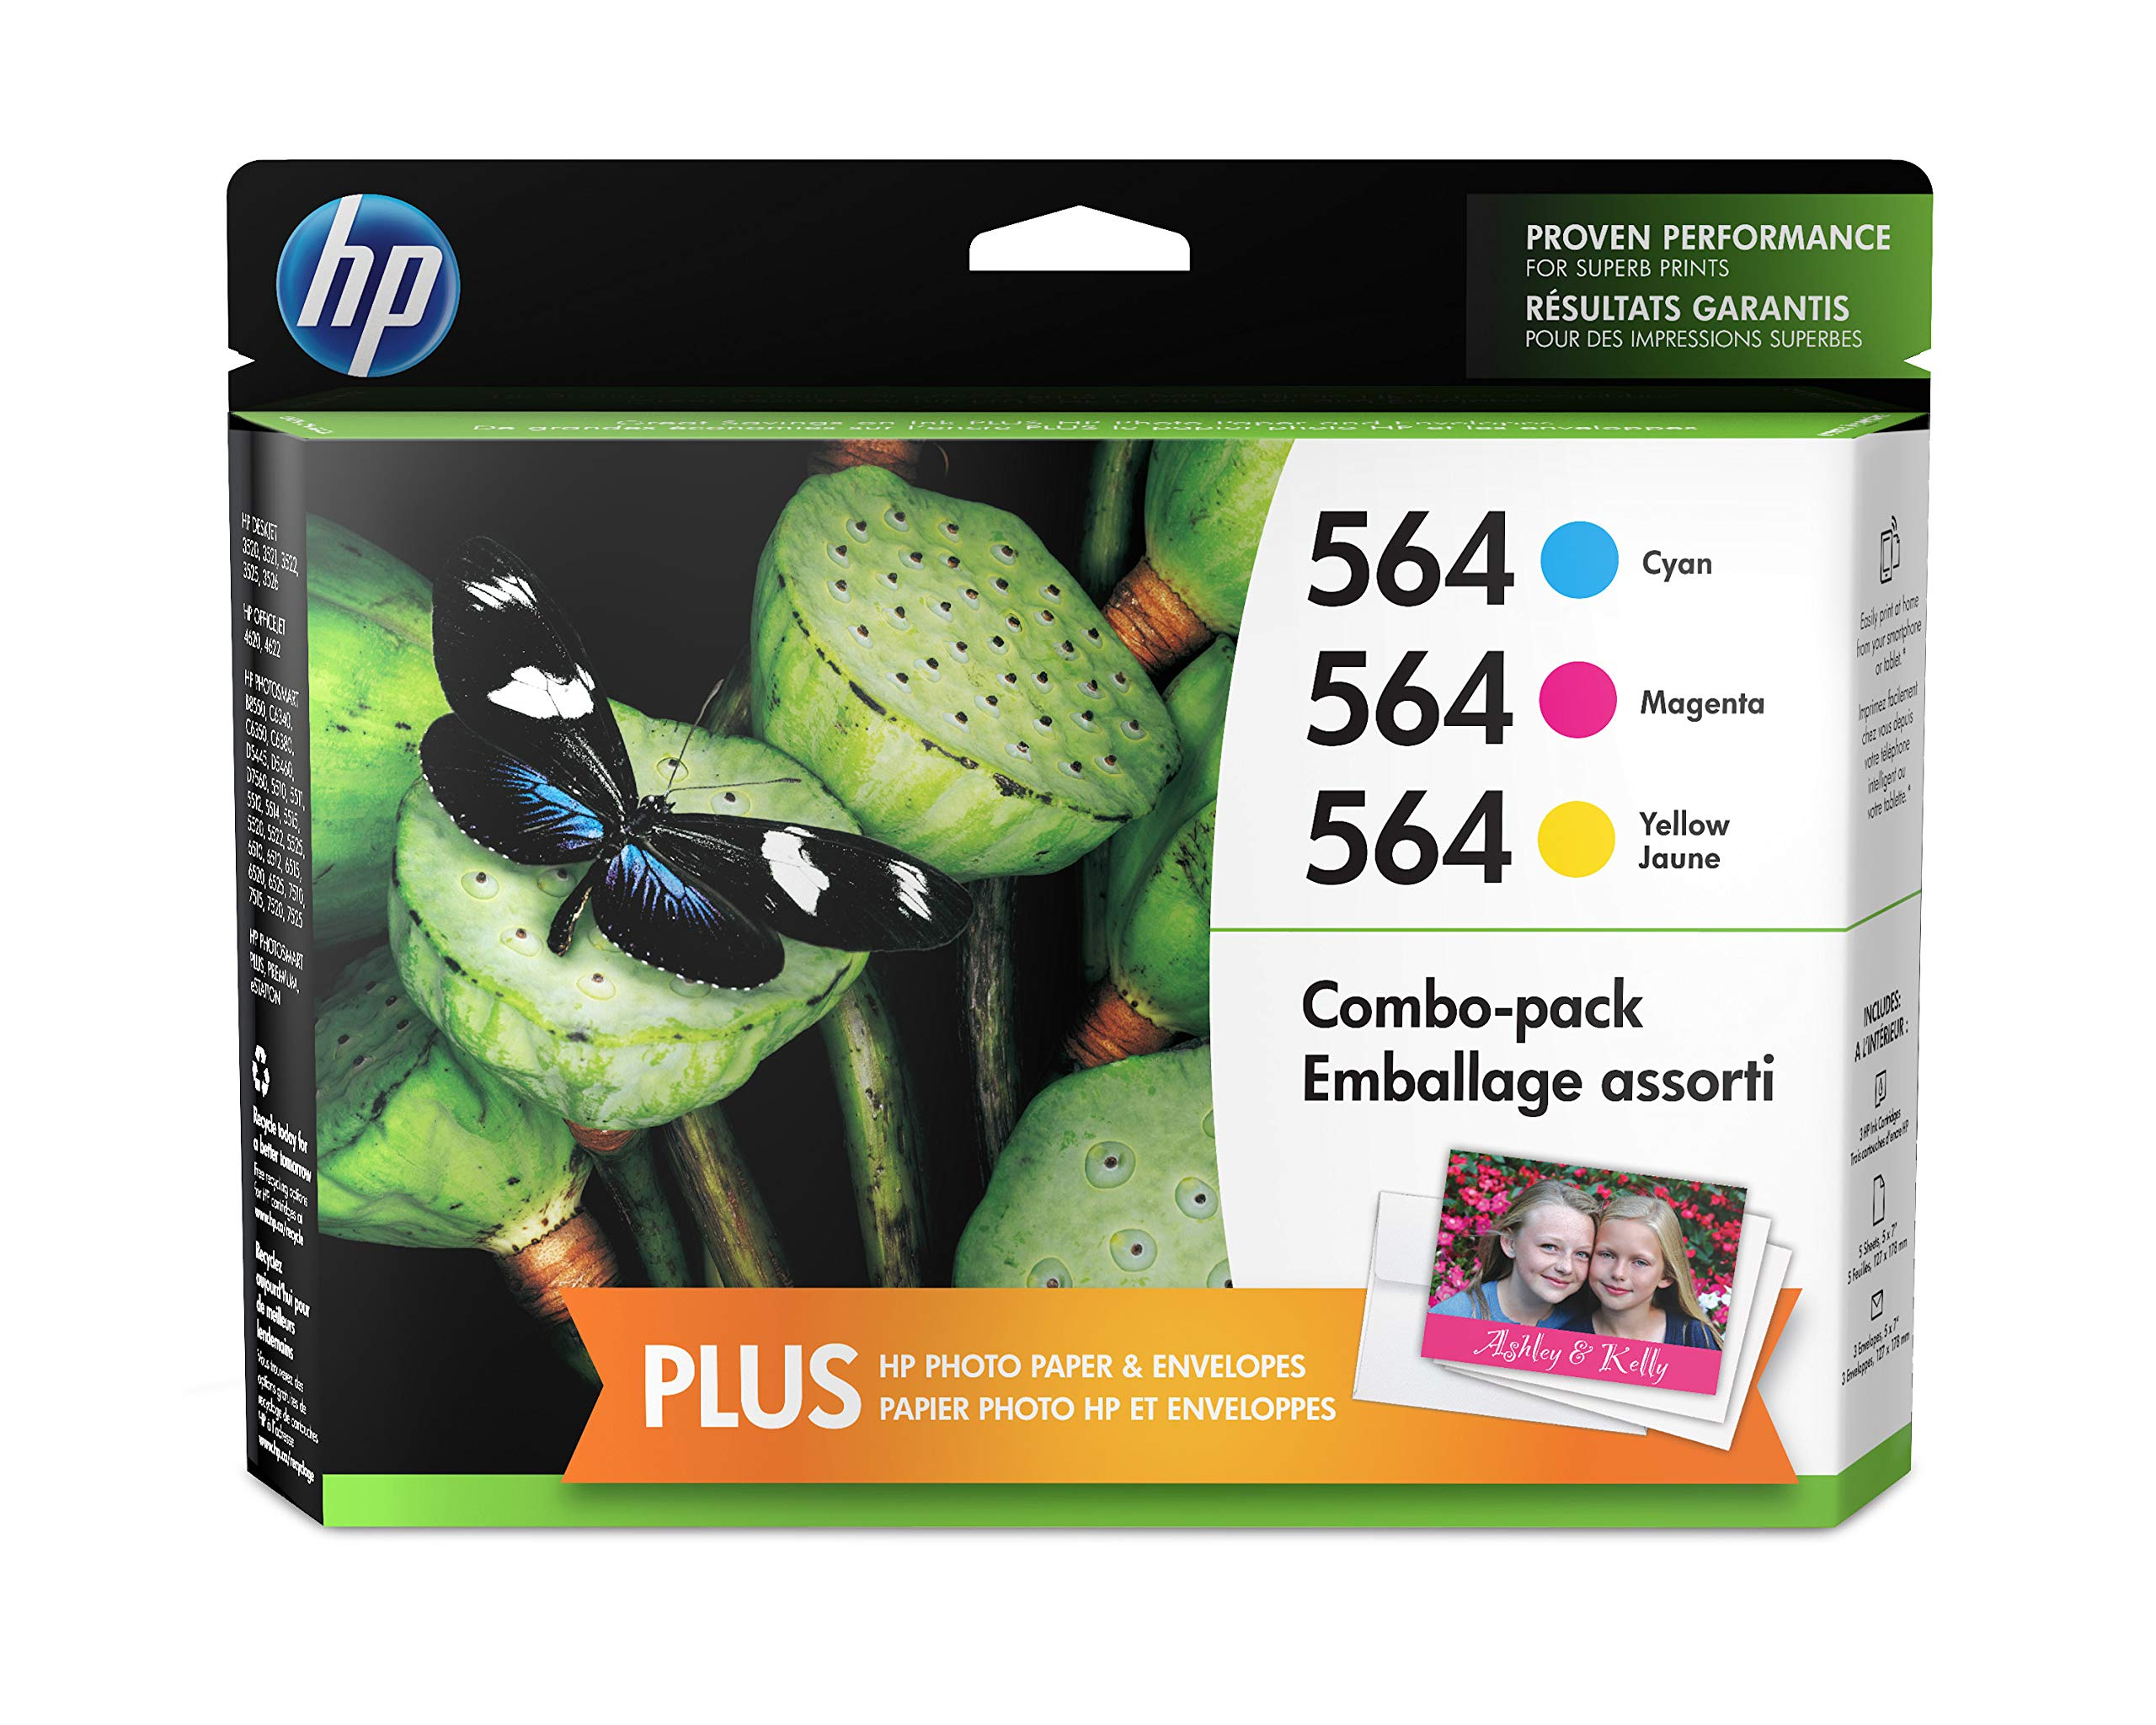 HP 564, 3 Cartridges with Photo Paper Cyan, Magenta, Yellow CB318WN, CB319WN, CB320WN